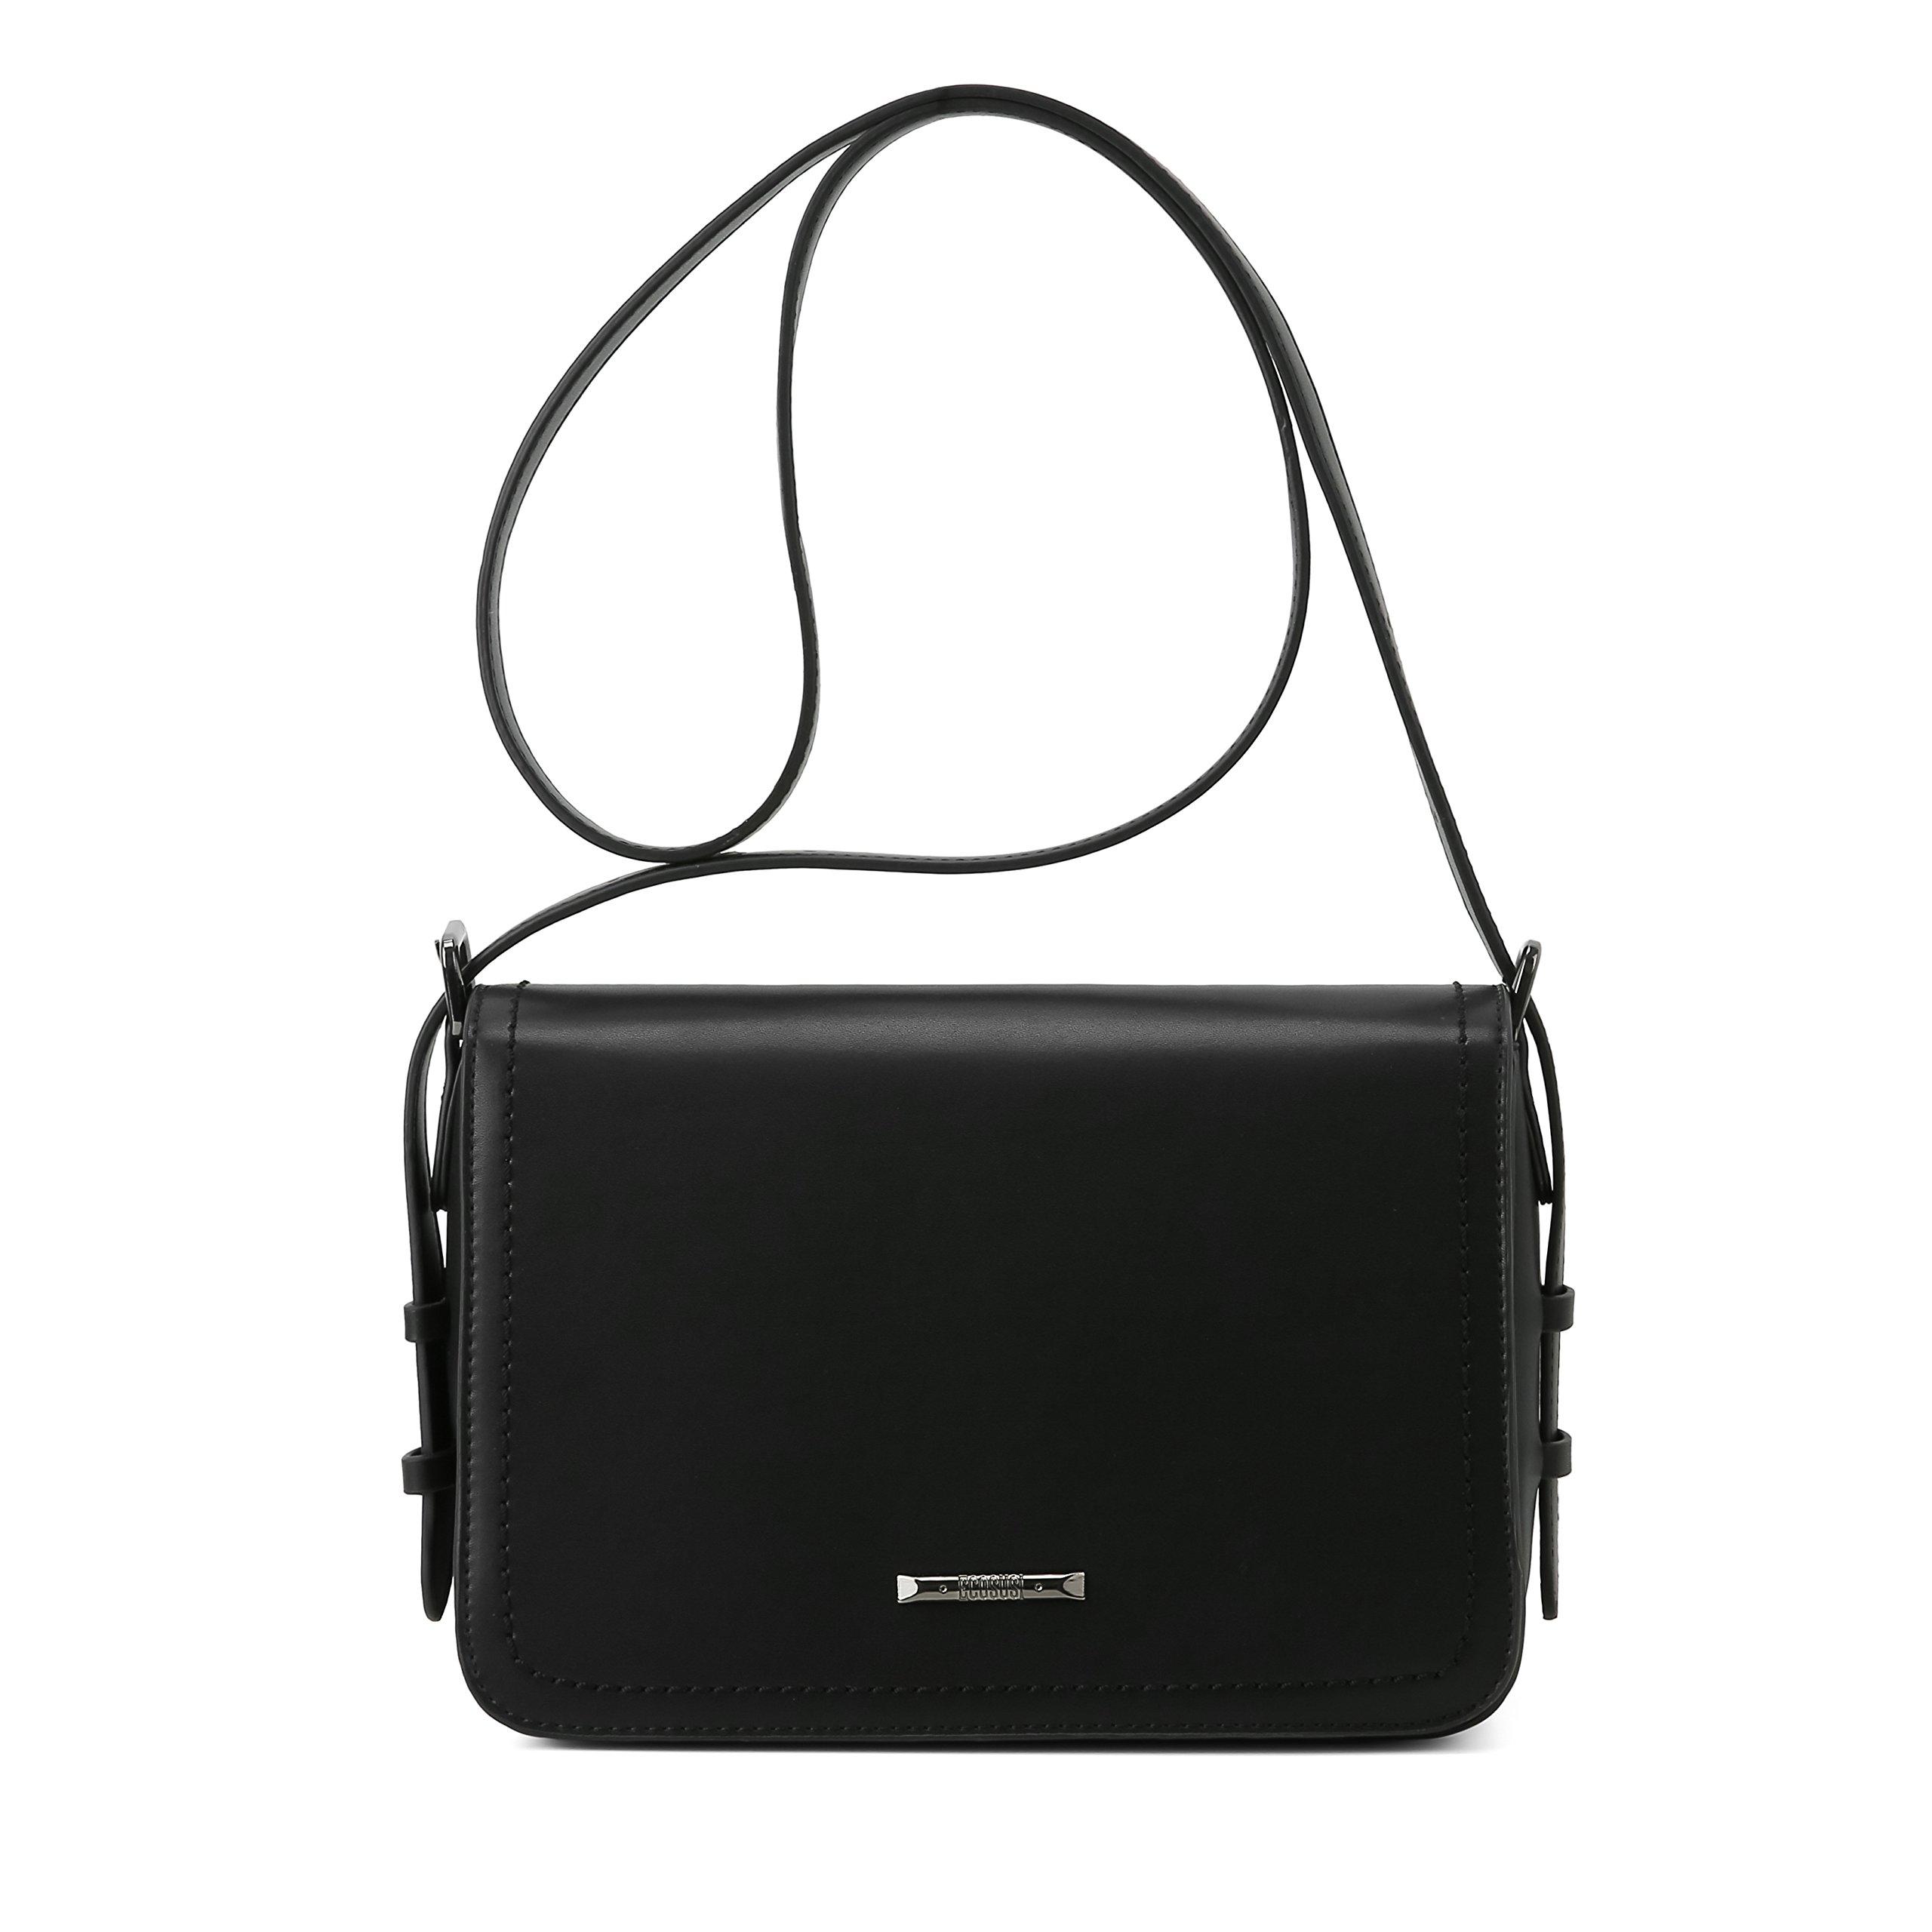 ECOSUSI Women's Crossbody Shoulder Bags Fashion FlapoverPurse with Adjustable Shoulder Strap, Black